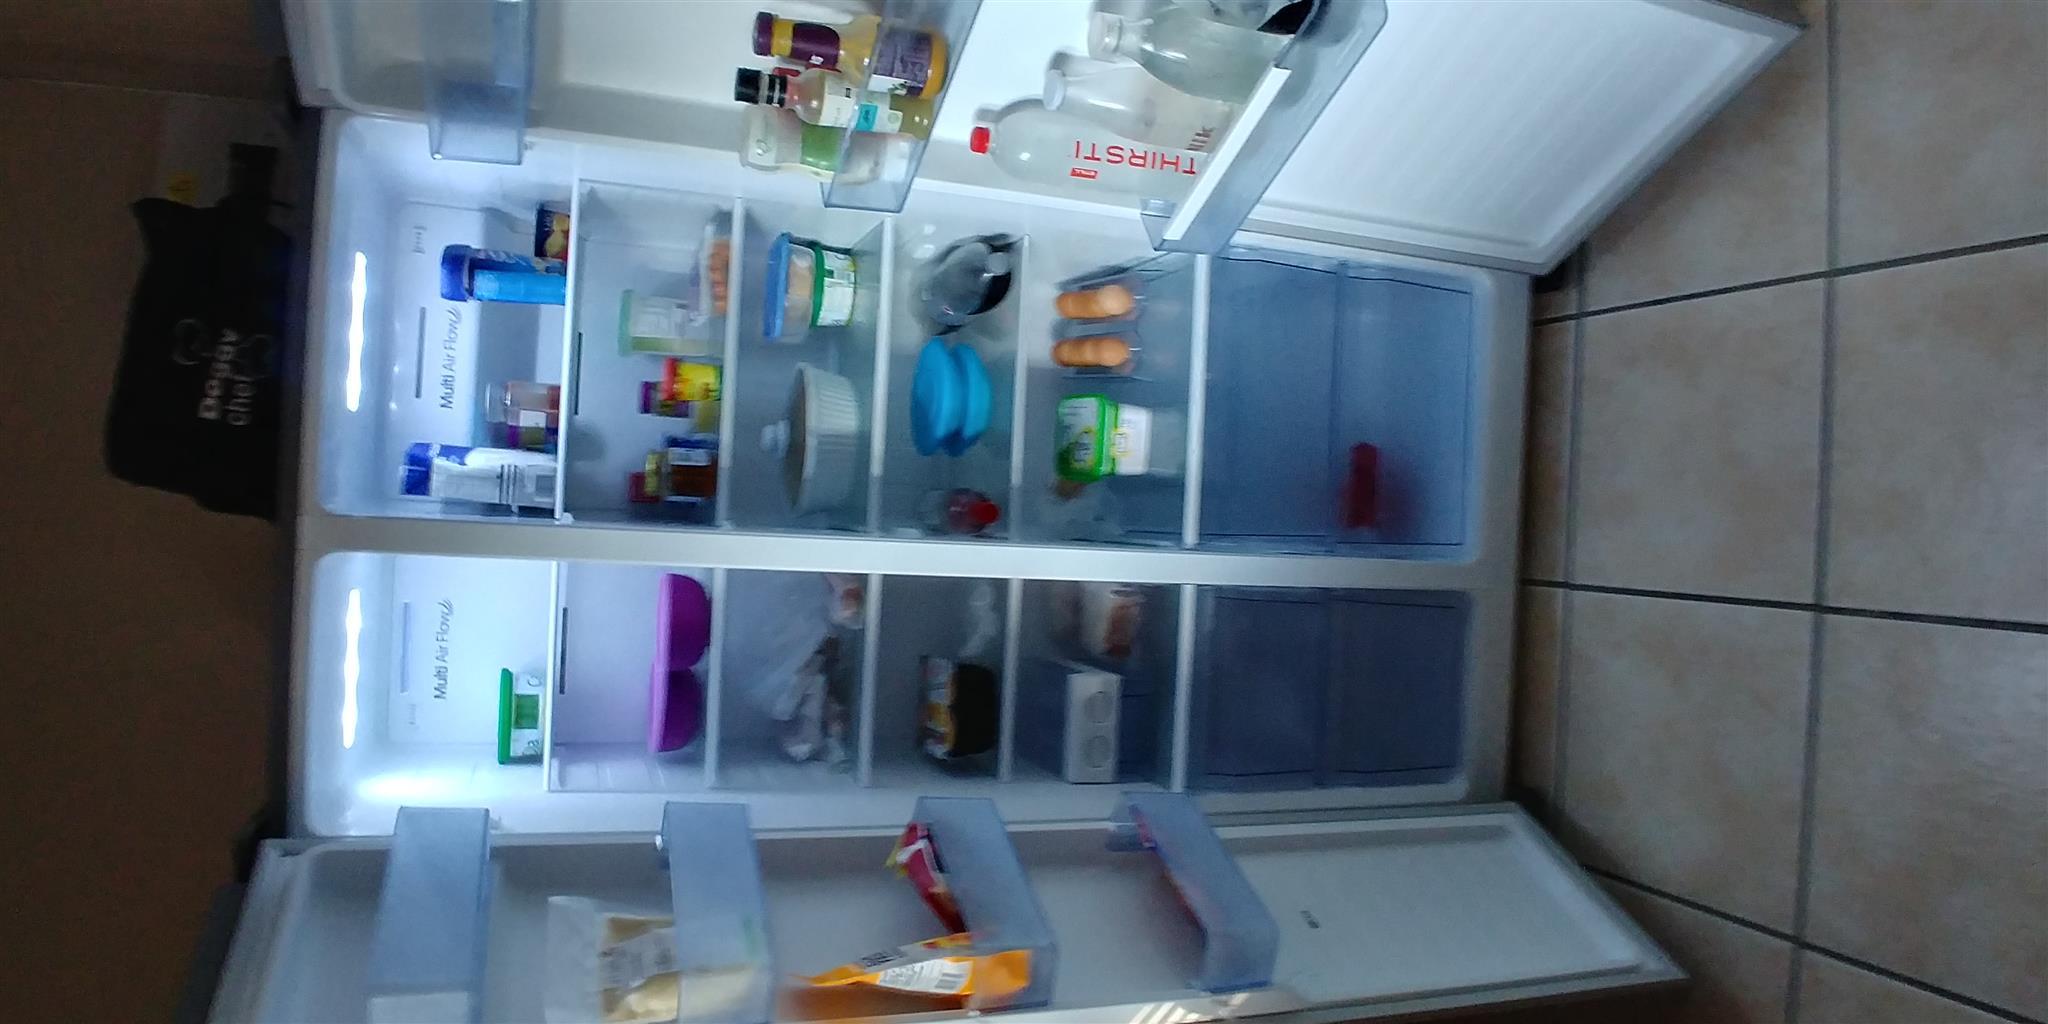 Hisence Side by Side Fridge/Freezer For Sale